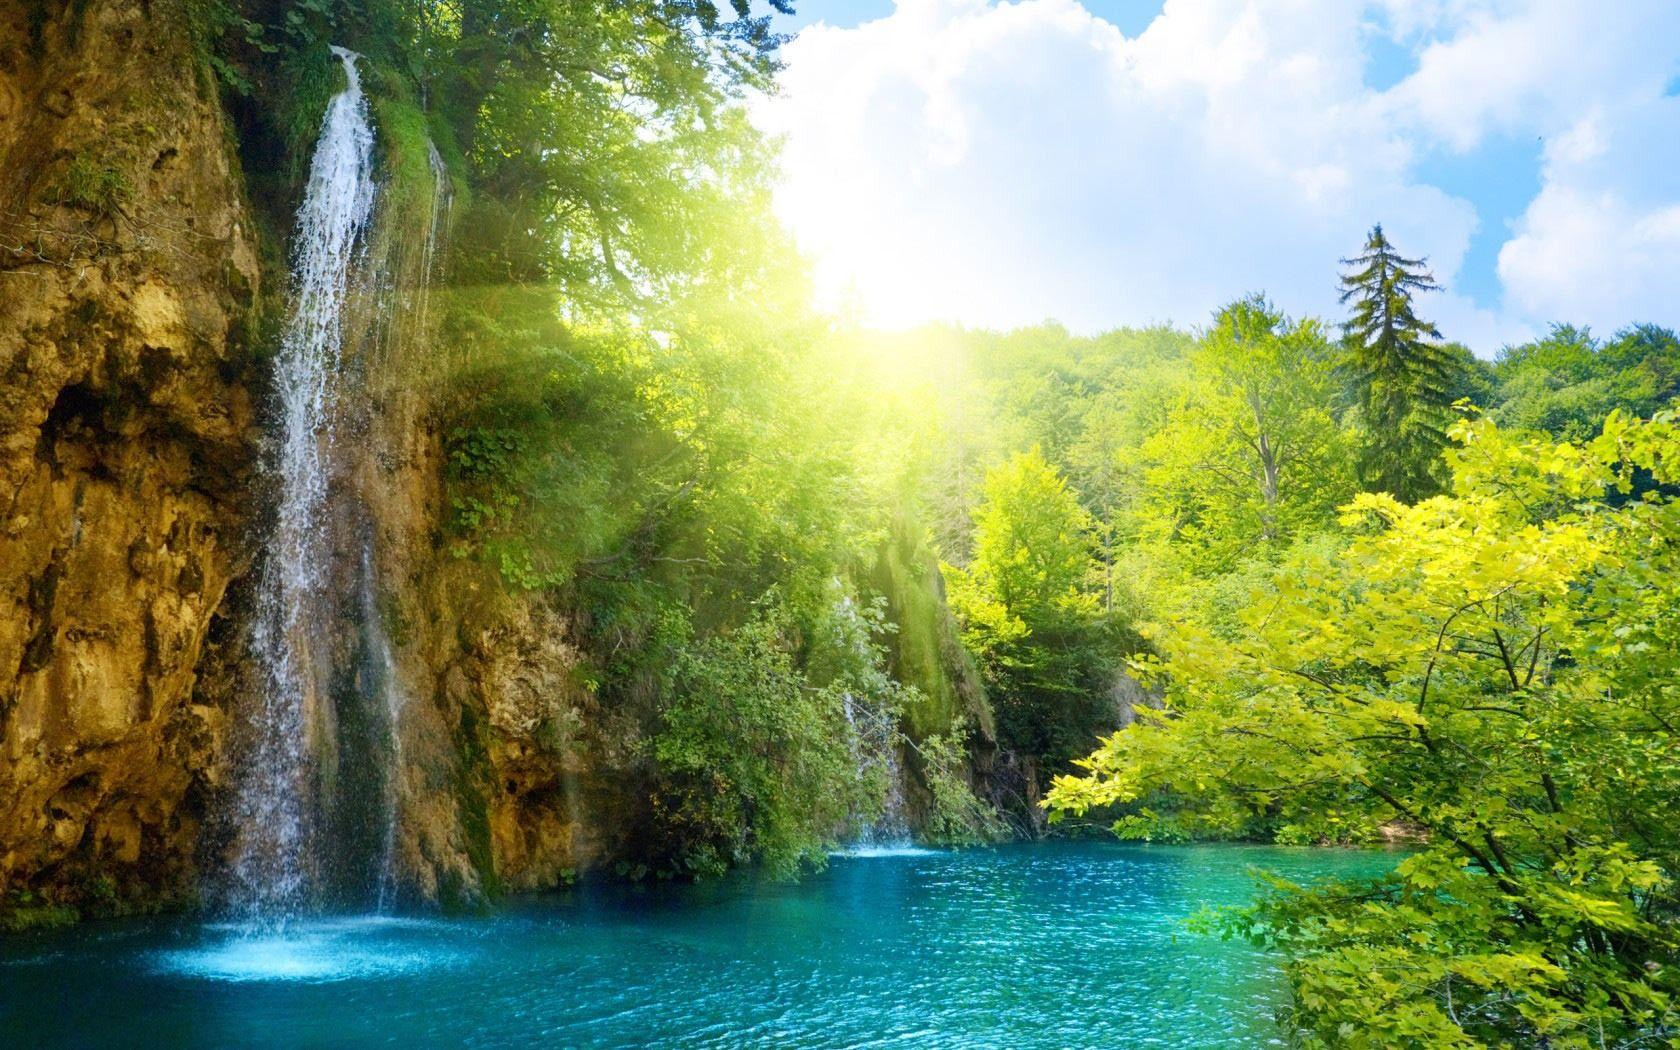 Gorgeous Waterfall Wallpaper Beautiful Nature Hd Nature Wallpapers